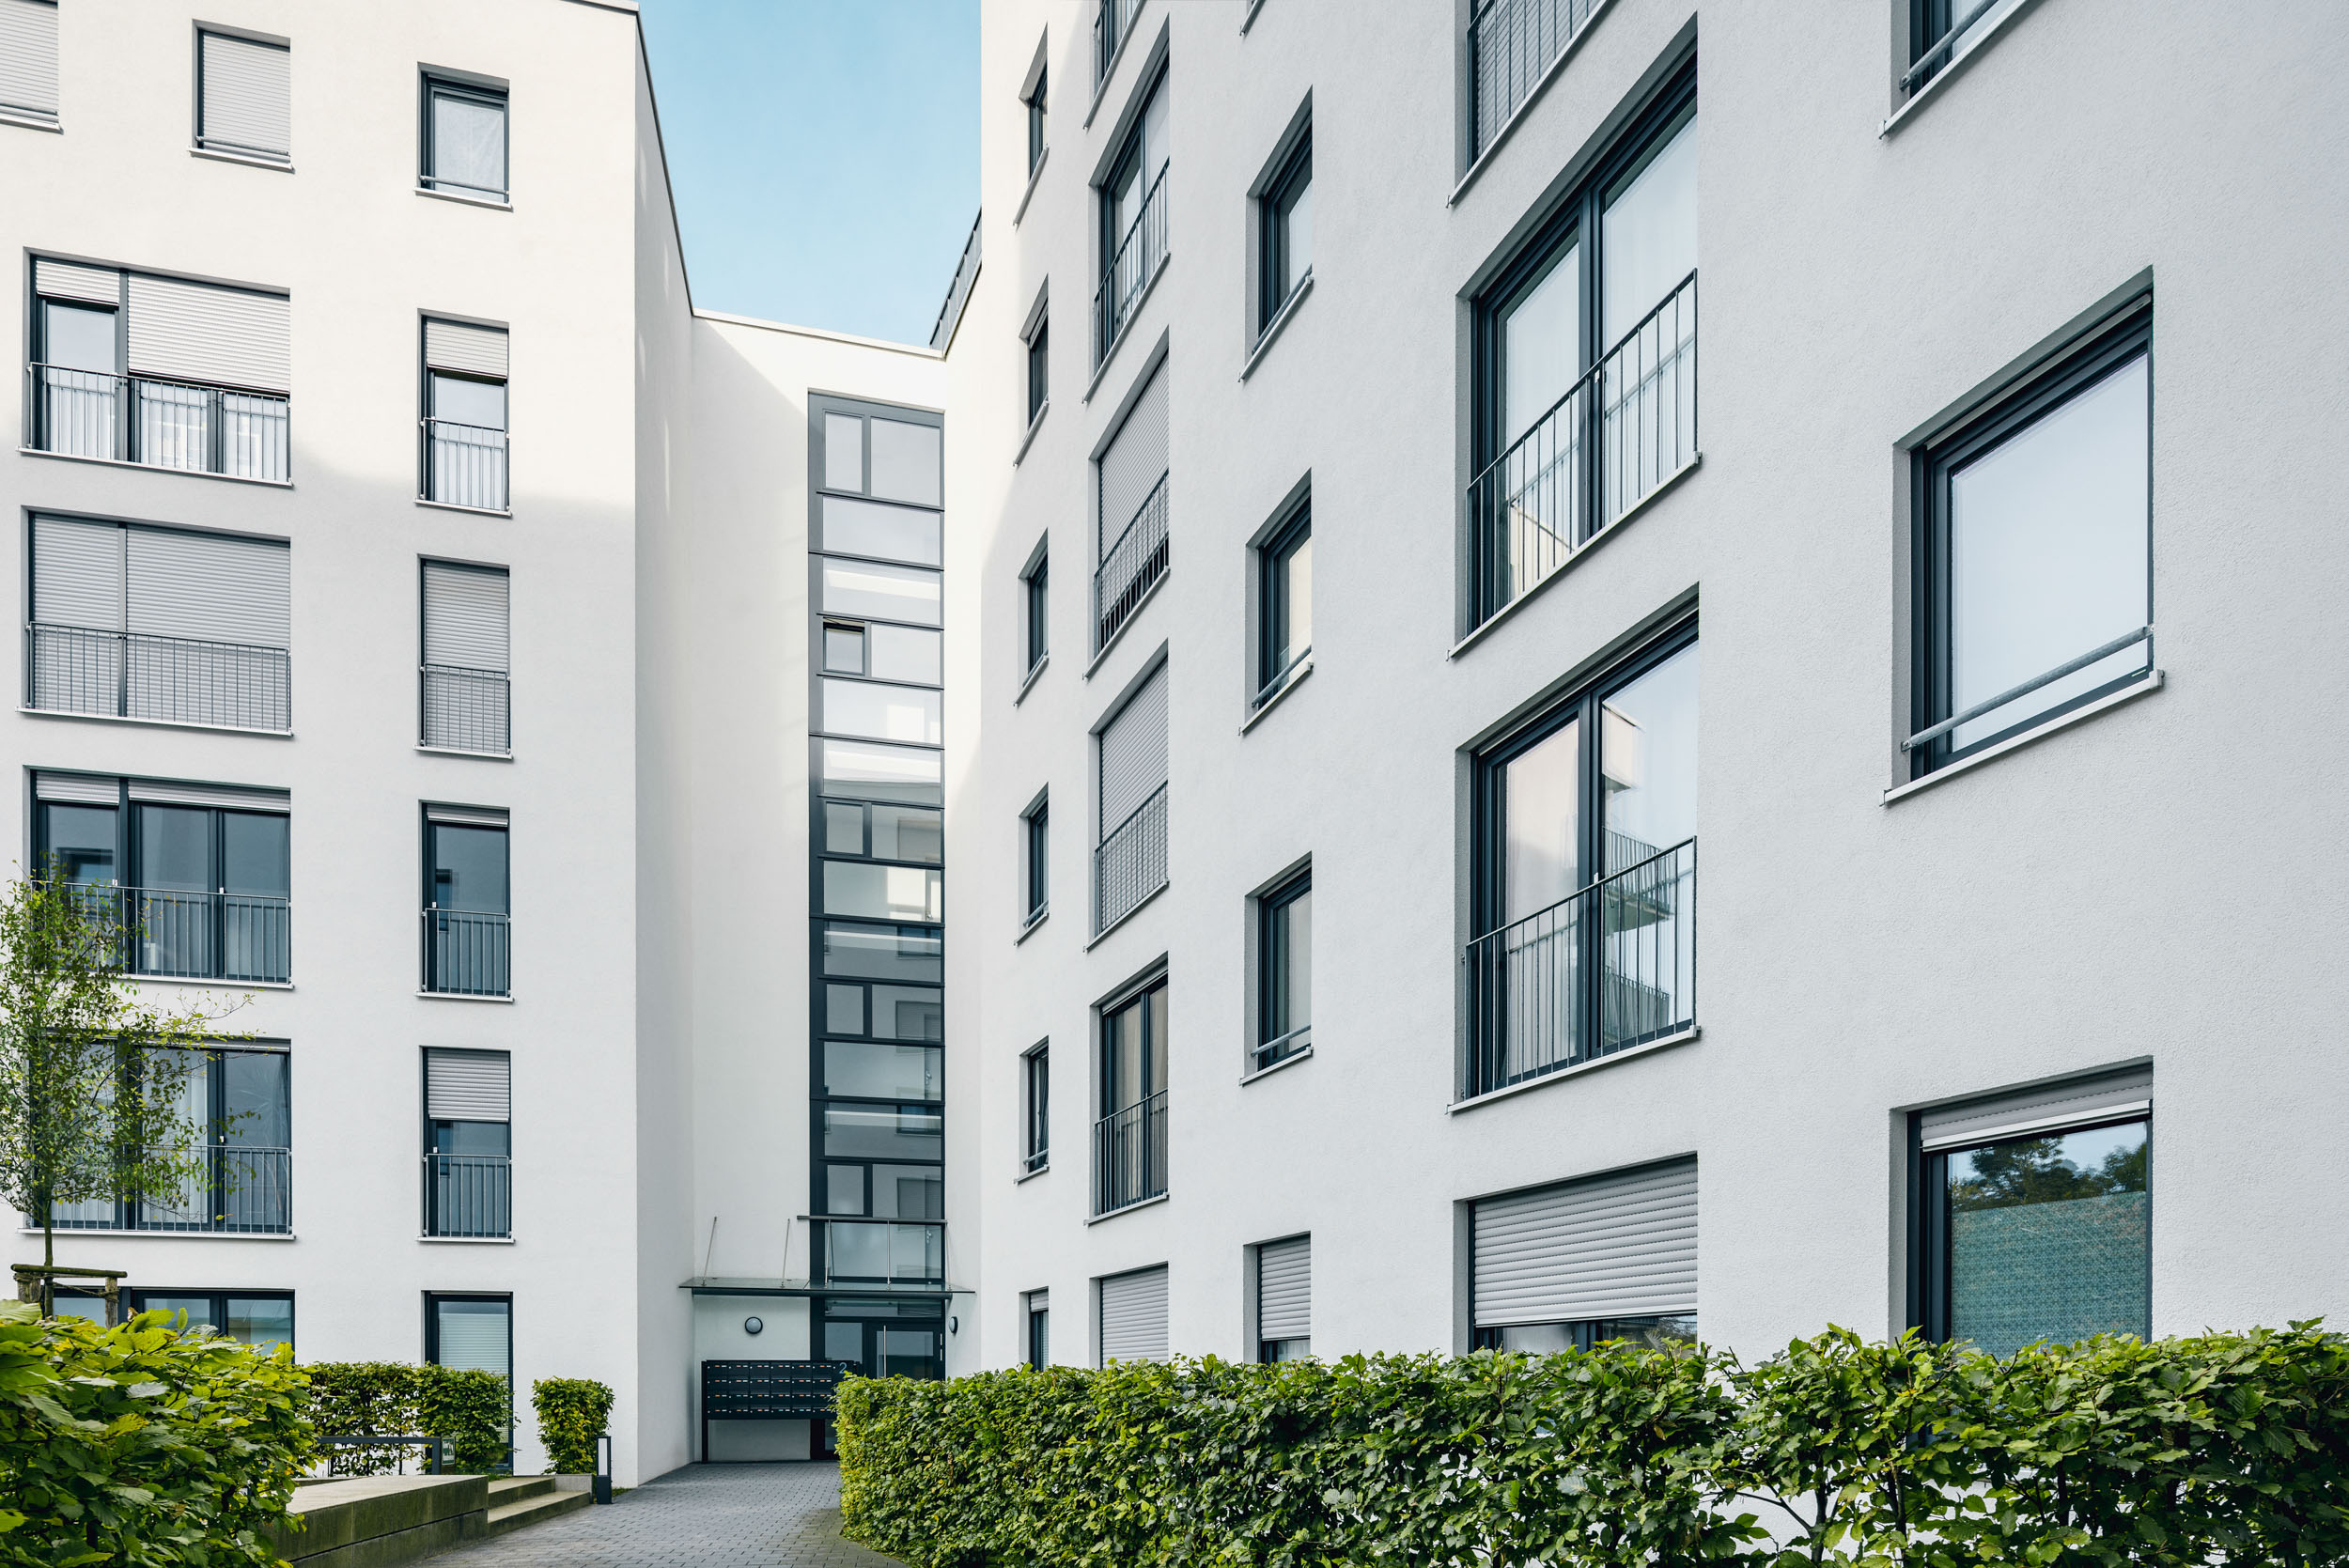 Gustav-Epple-Bauunternehmung-Meluner-Straße-MLX8017